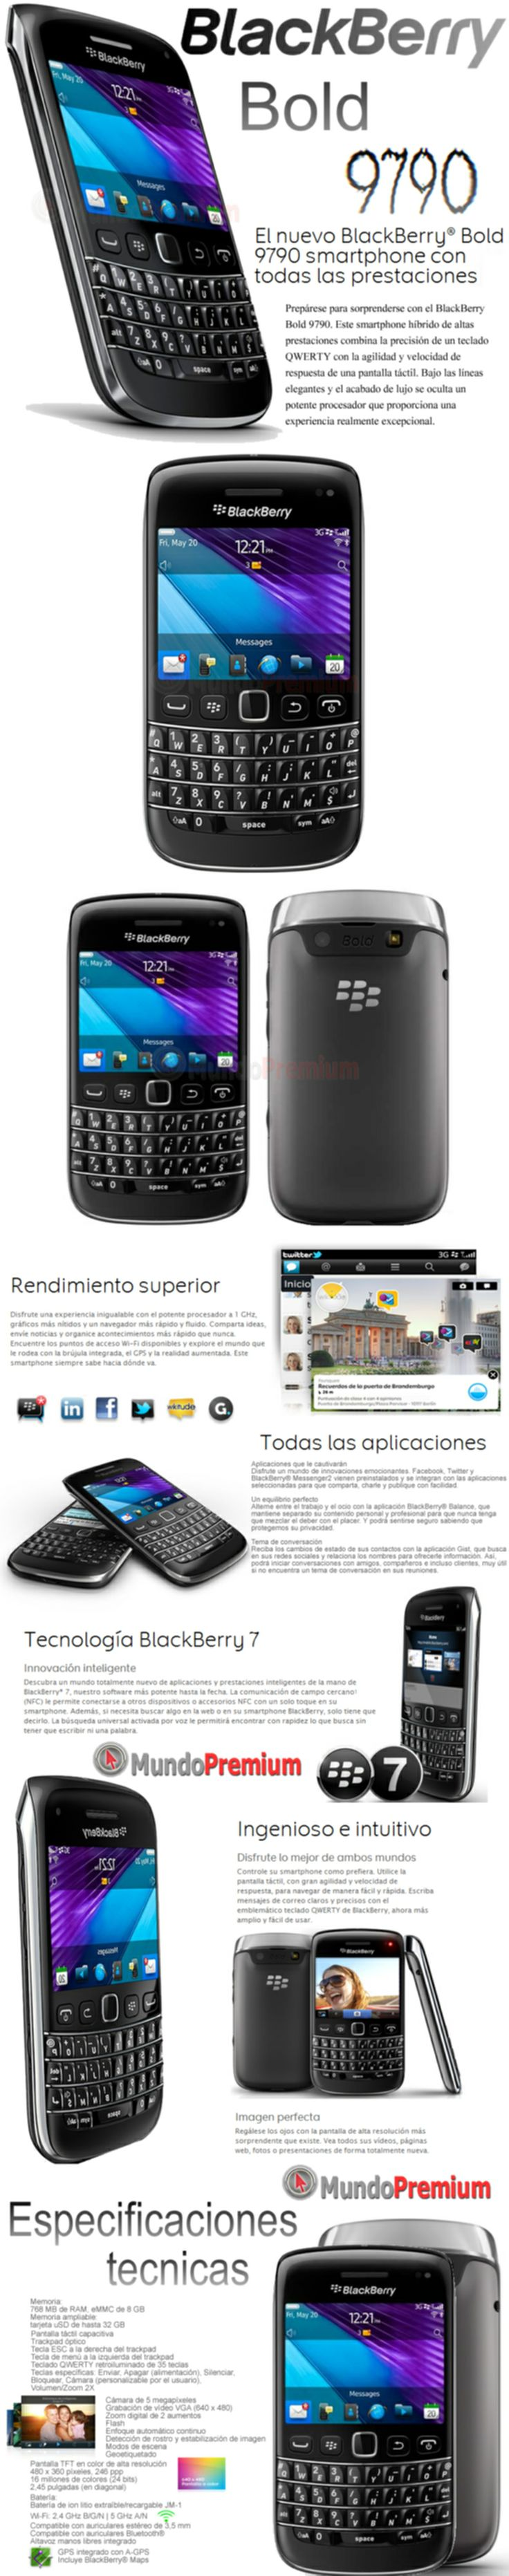 cc23ef7b7435e3fd229de0f66ba24d6c bold colors blackberry bold